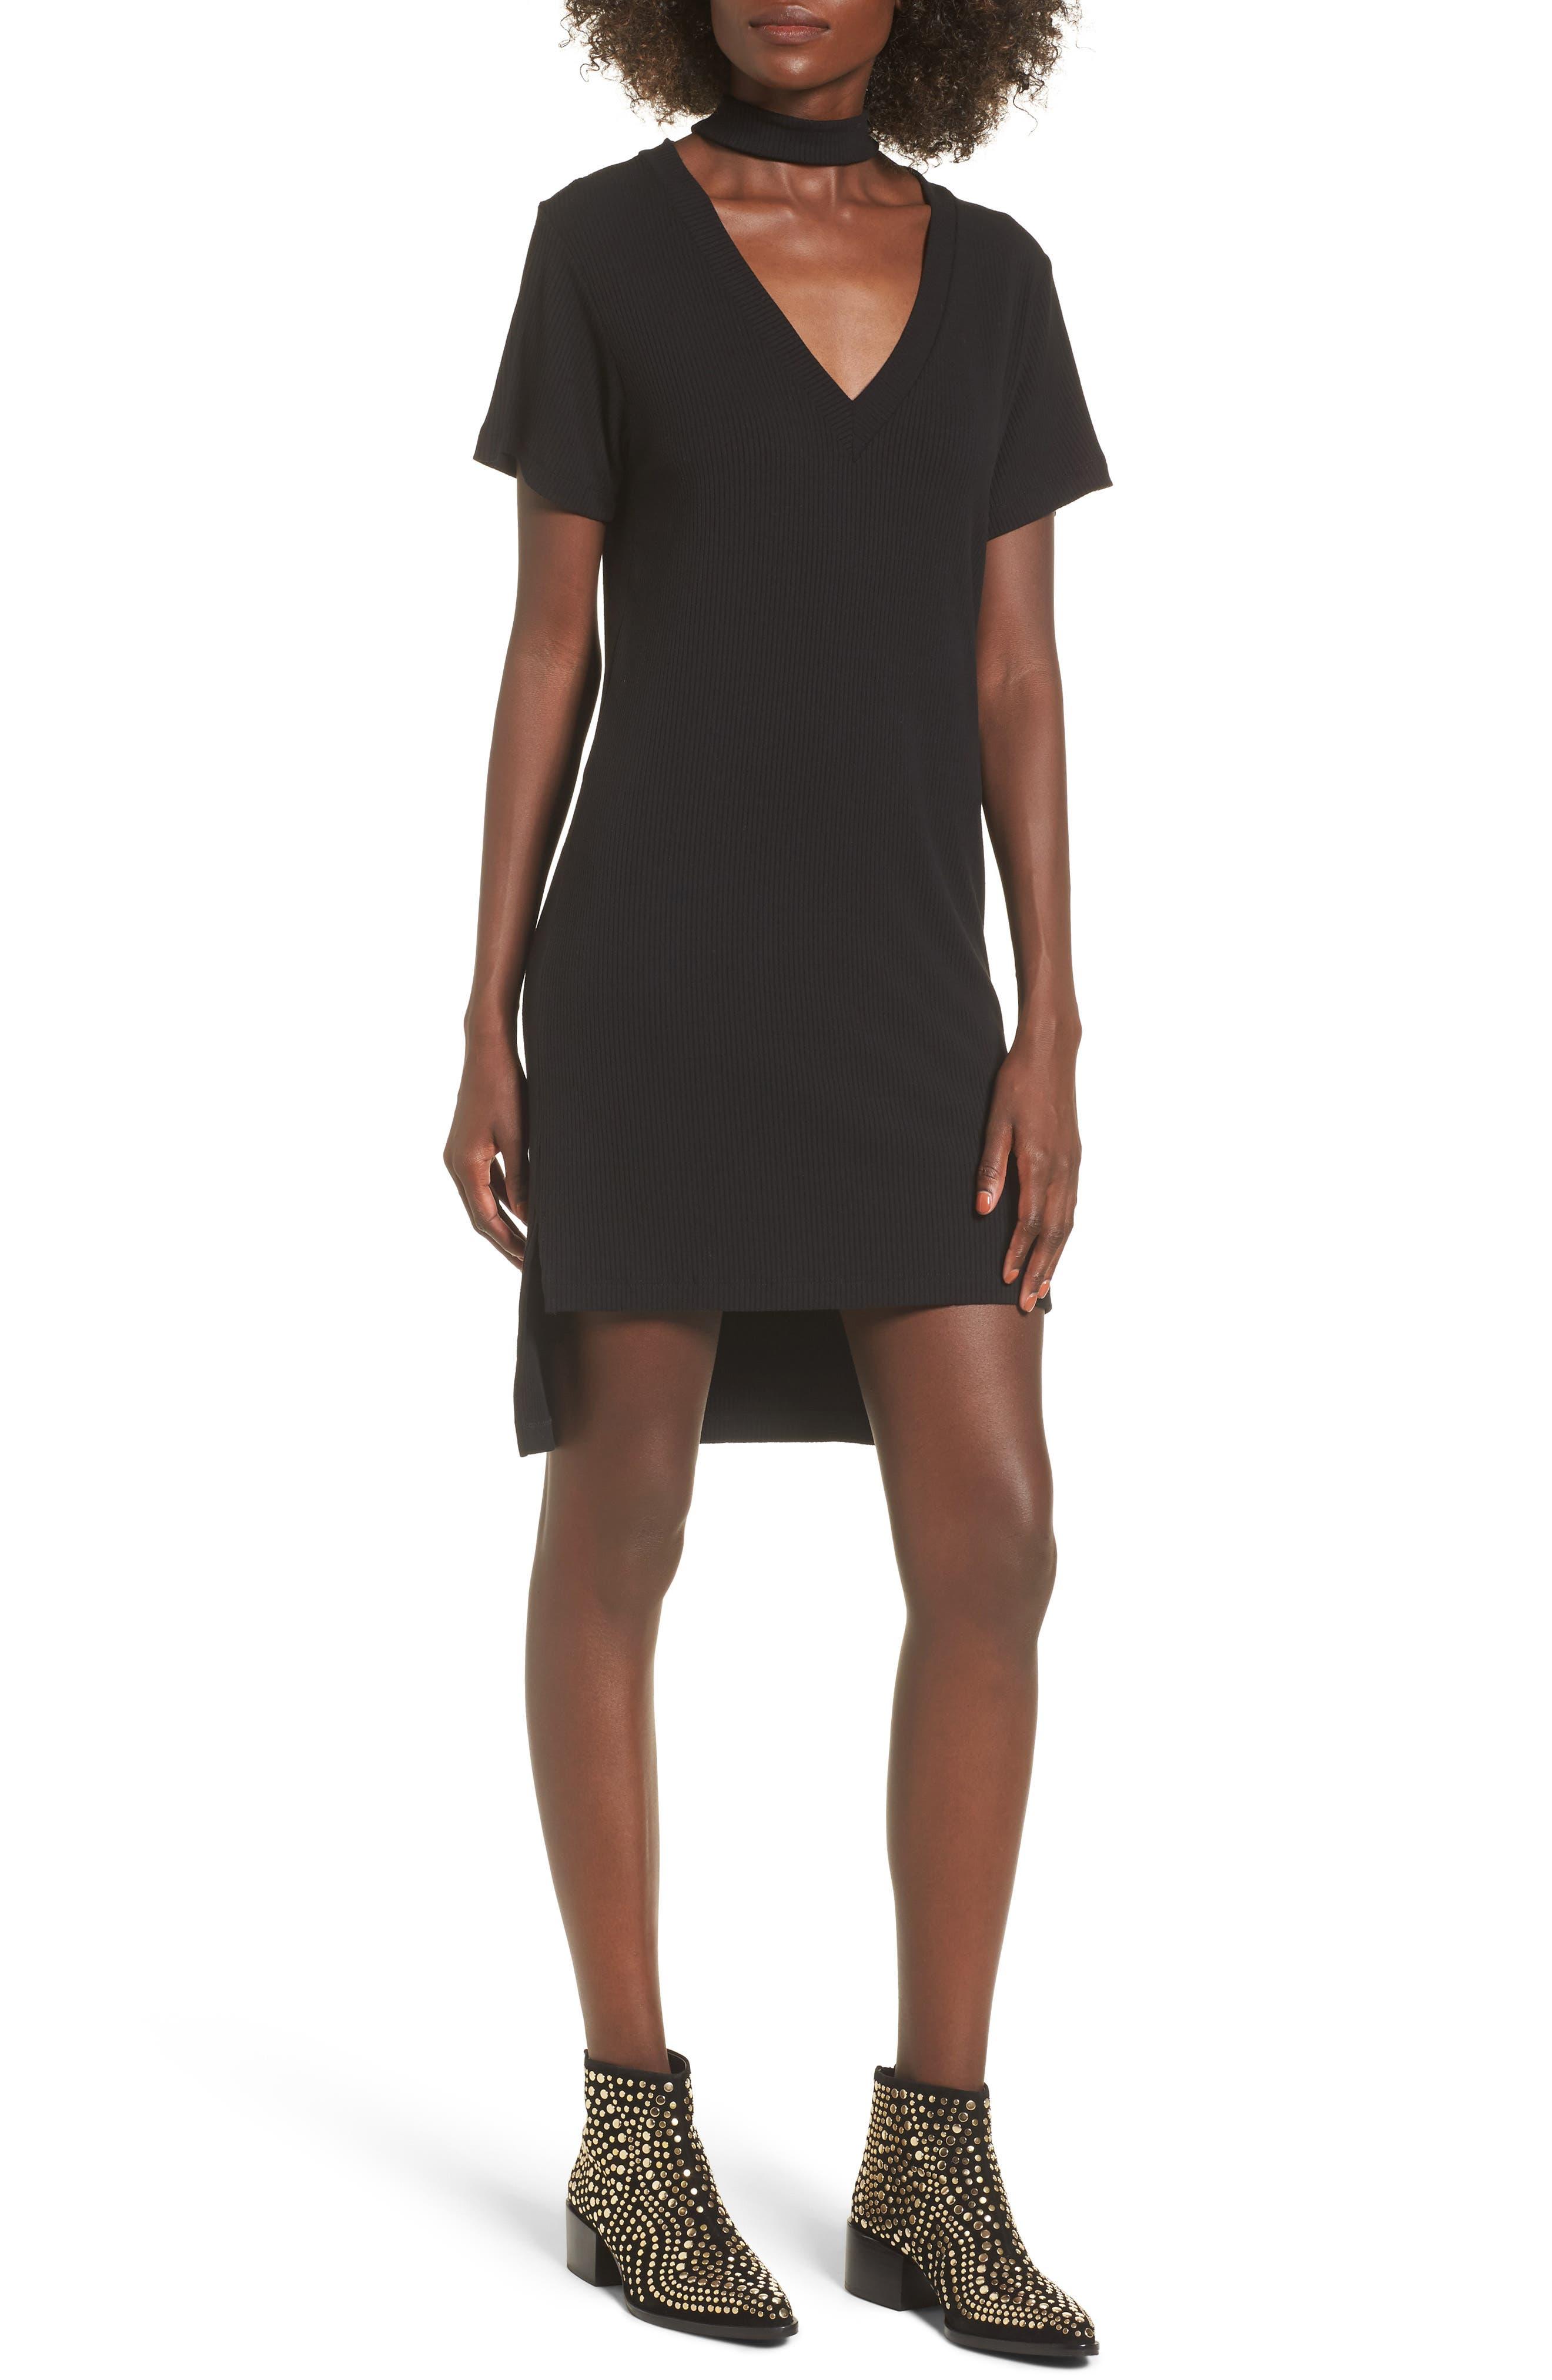 Alternate Image 1 Selected - LNA Klassen Choker Dress